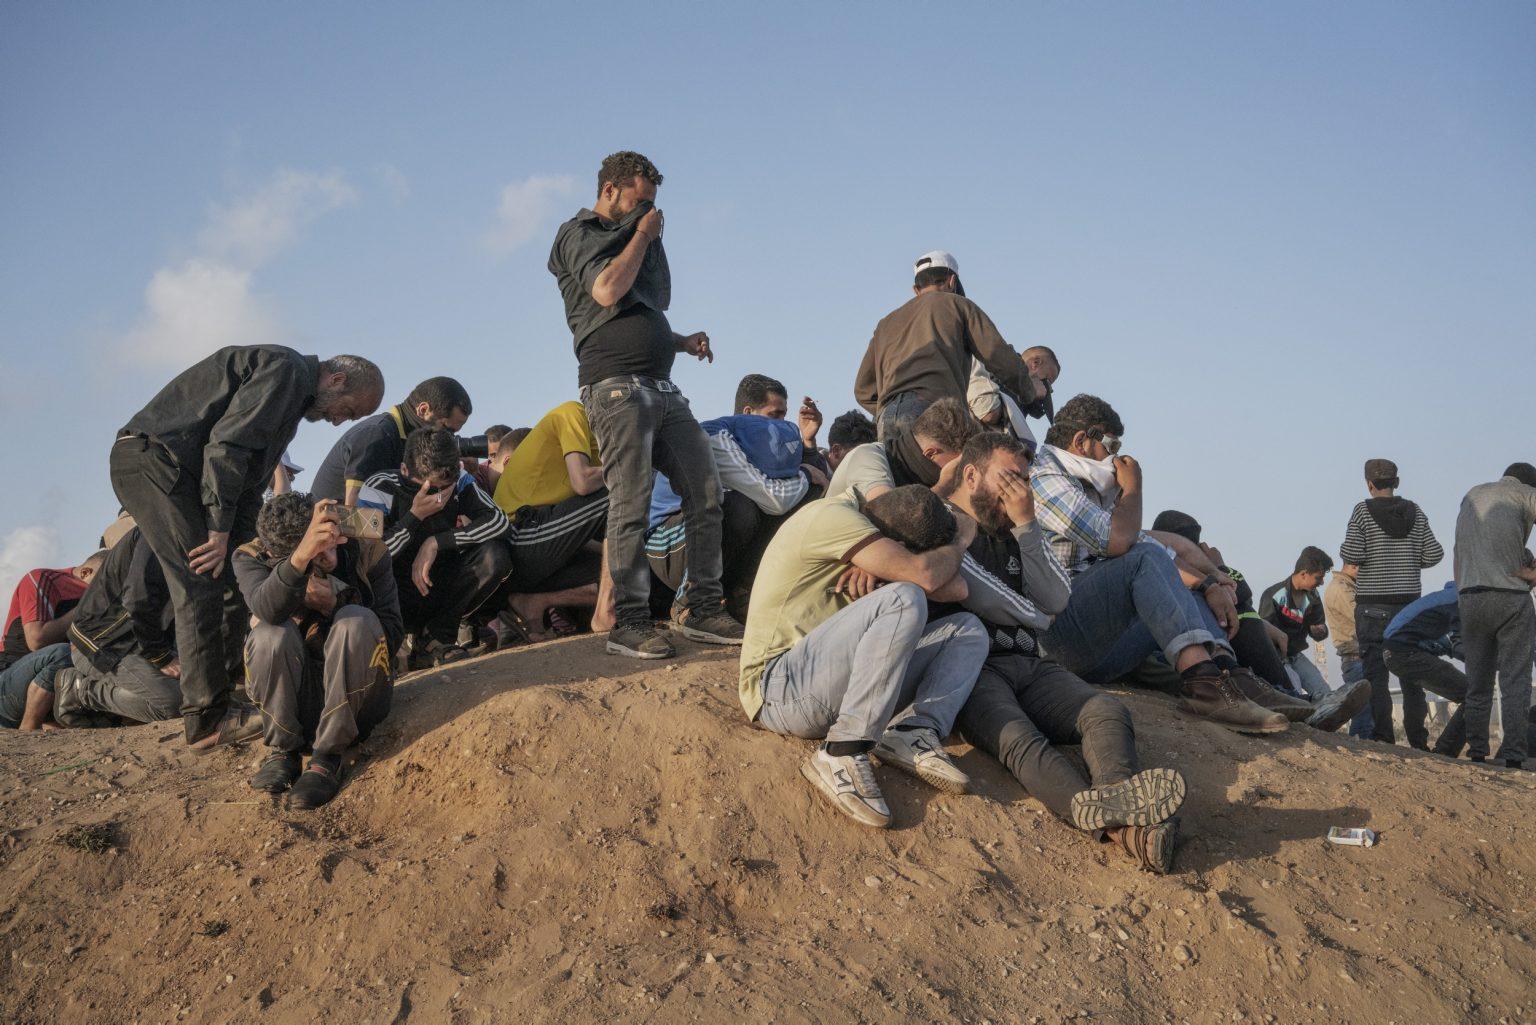 Gaza Strip, May 2018 - Palestinian cover their faces after Israeli forces fired tear gas along the Gaza-Israel border. >< Striscia di Gaza, maggio 2018 - Palestinesi si riparano il viso dai gas lacrimogeni lanciati dai soldati israeliani.